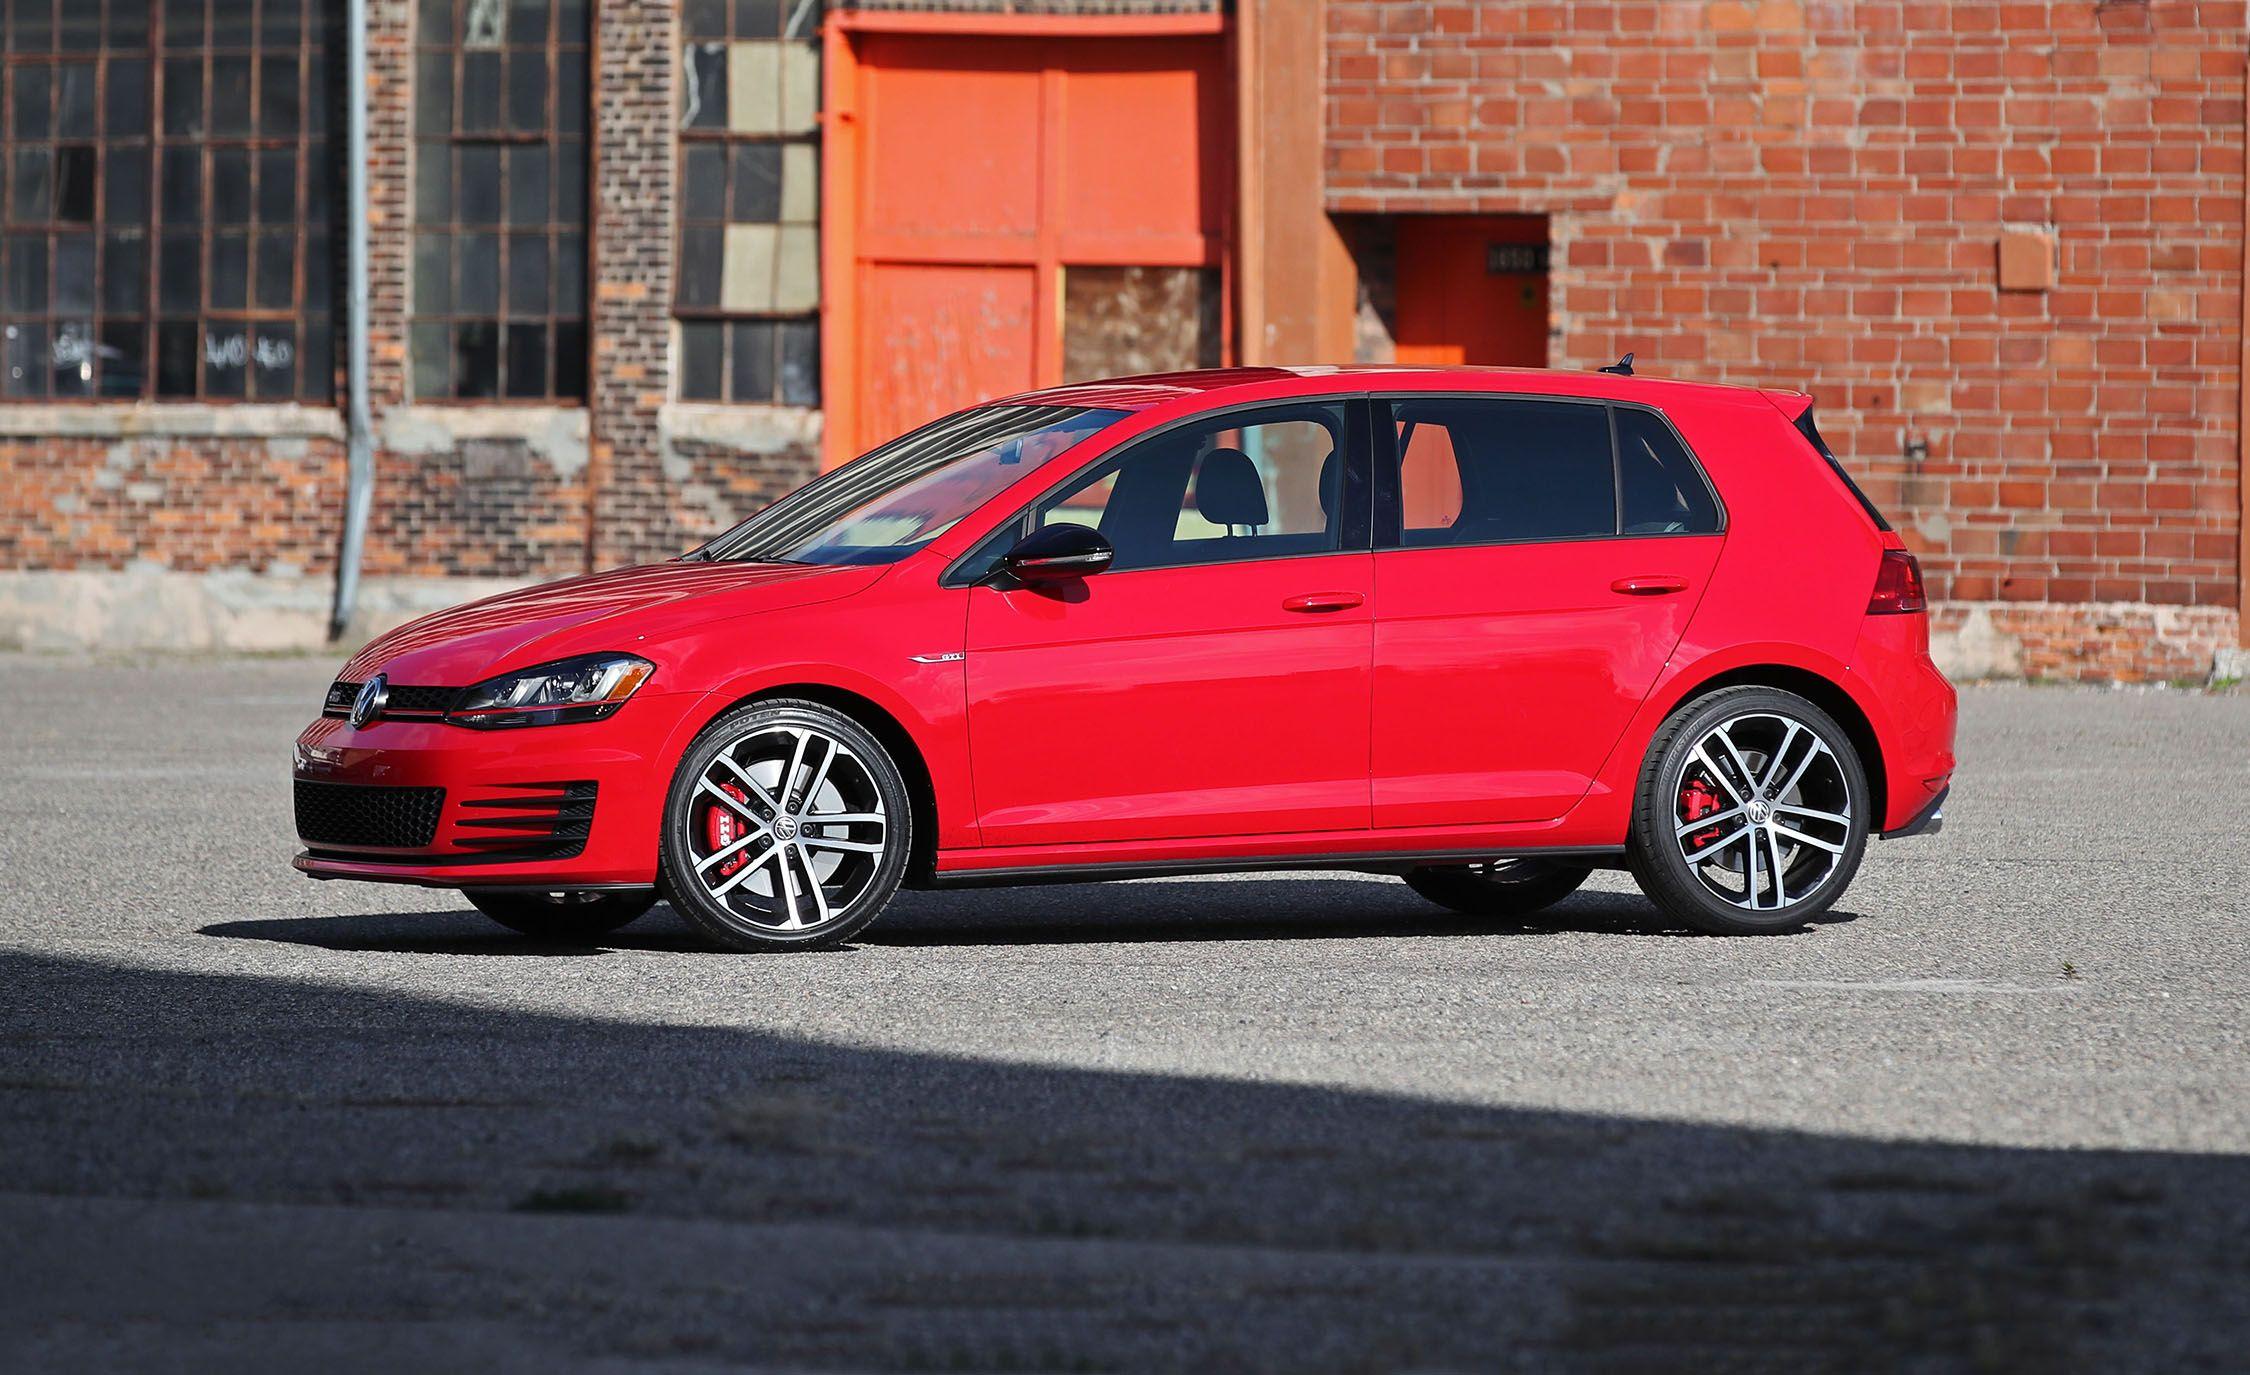 Volkswagen golf gti reviews